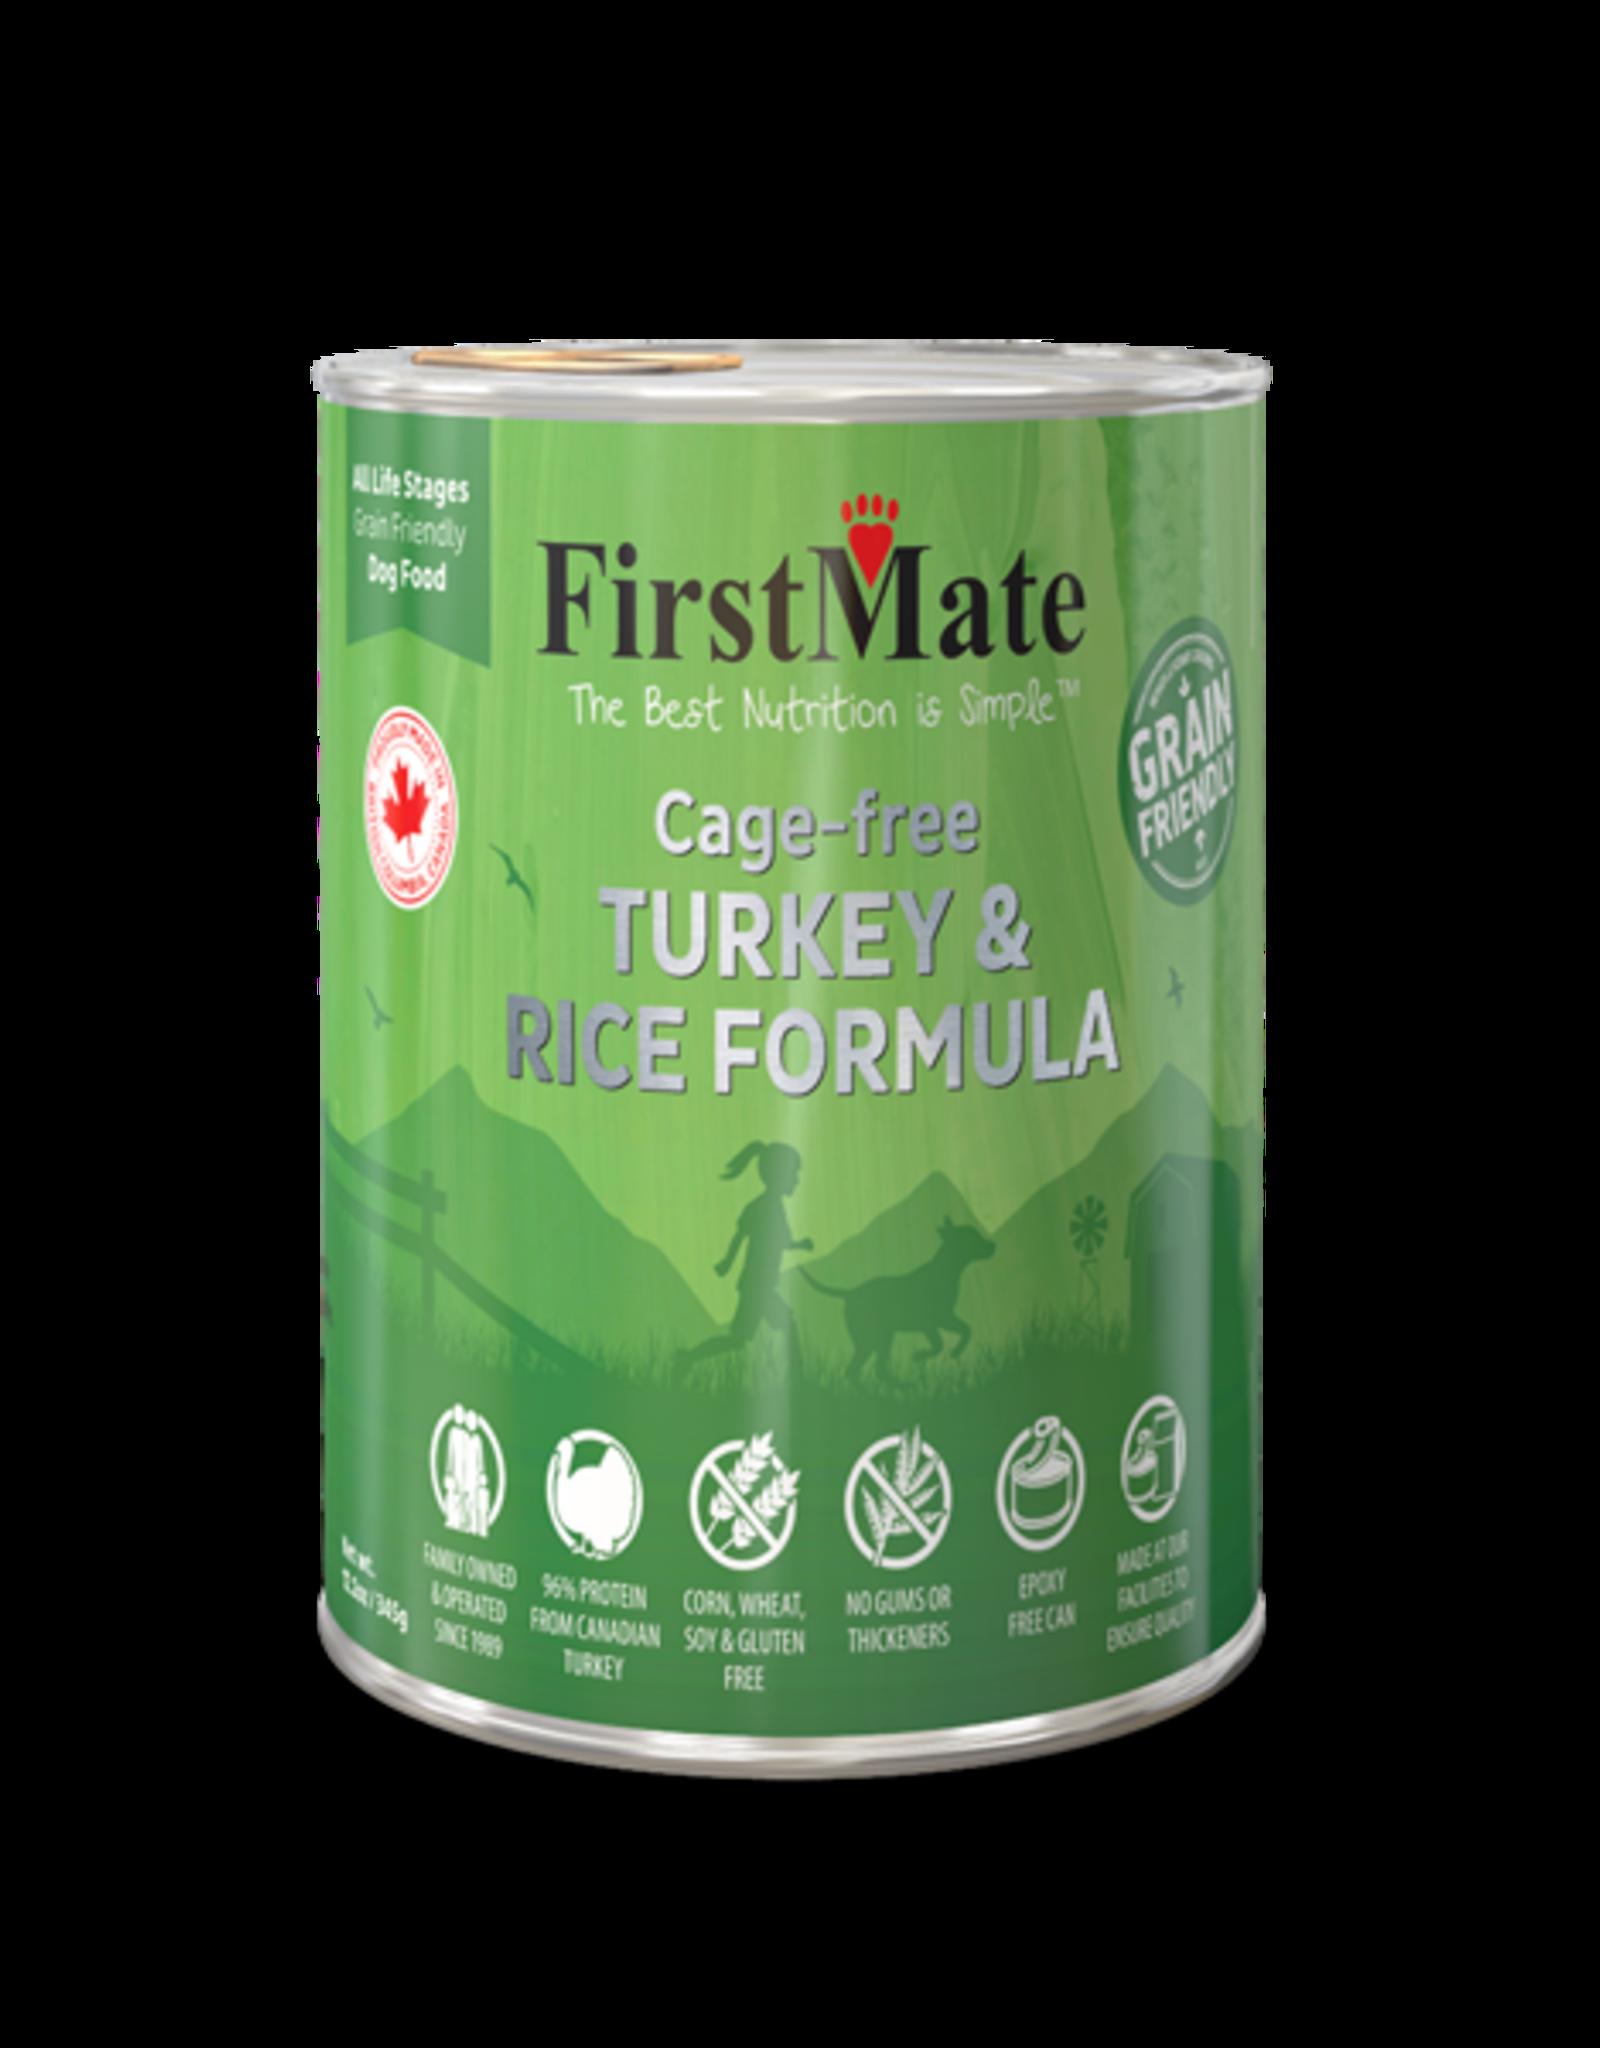 FirstMate Pet Food Dog Turkey & Rice Pate - Whole Grain 12oz